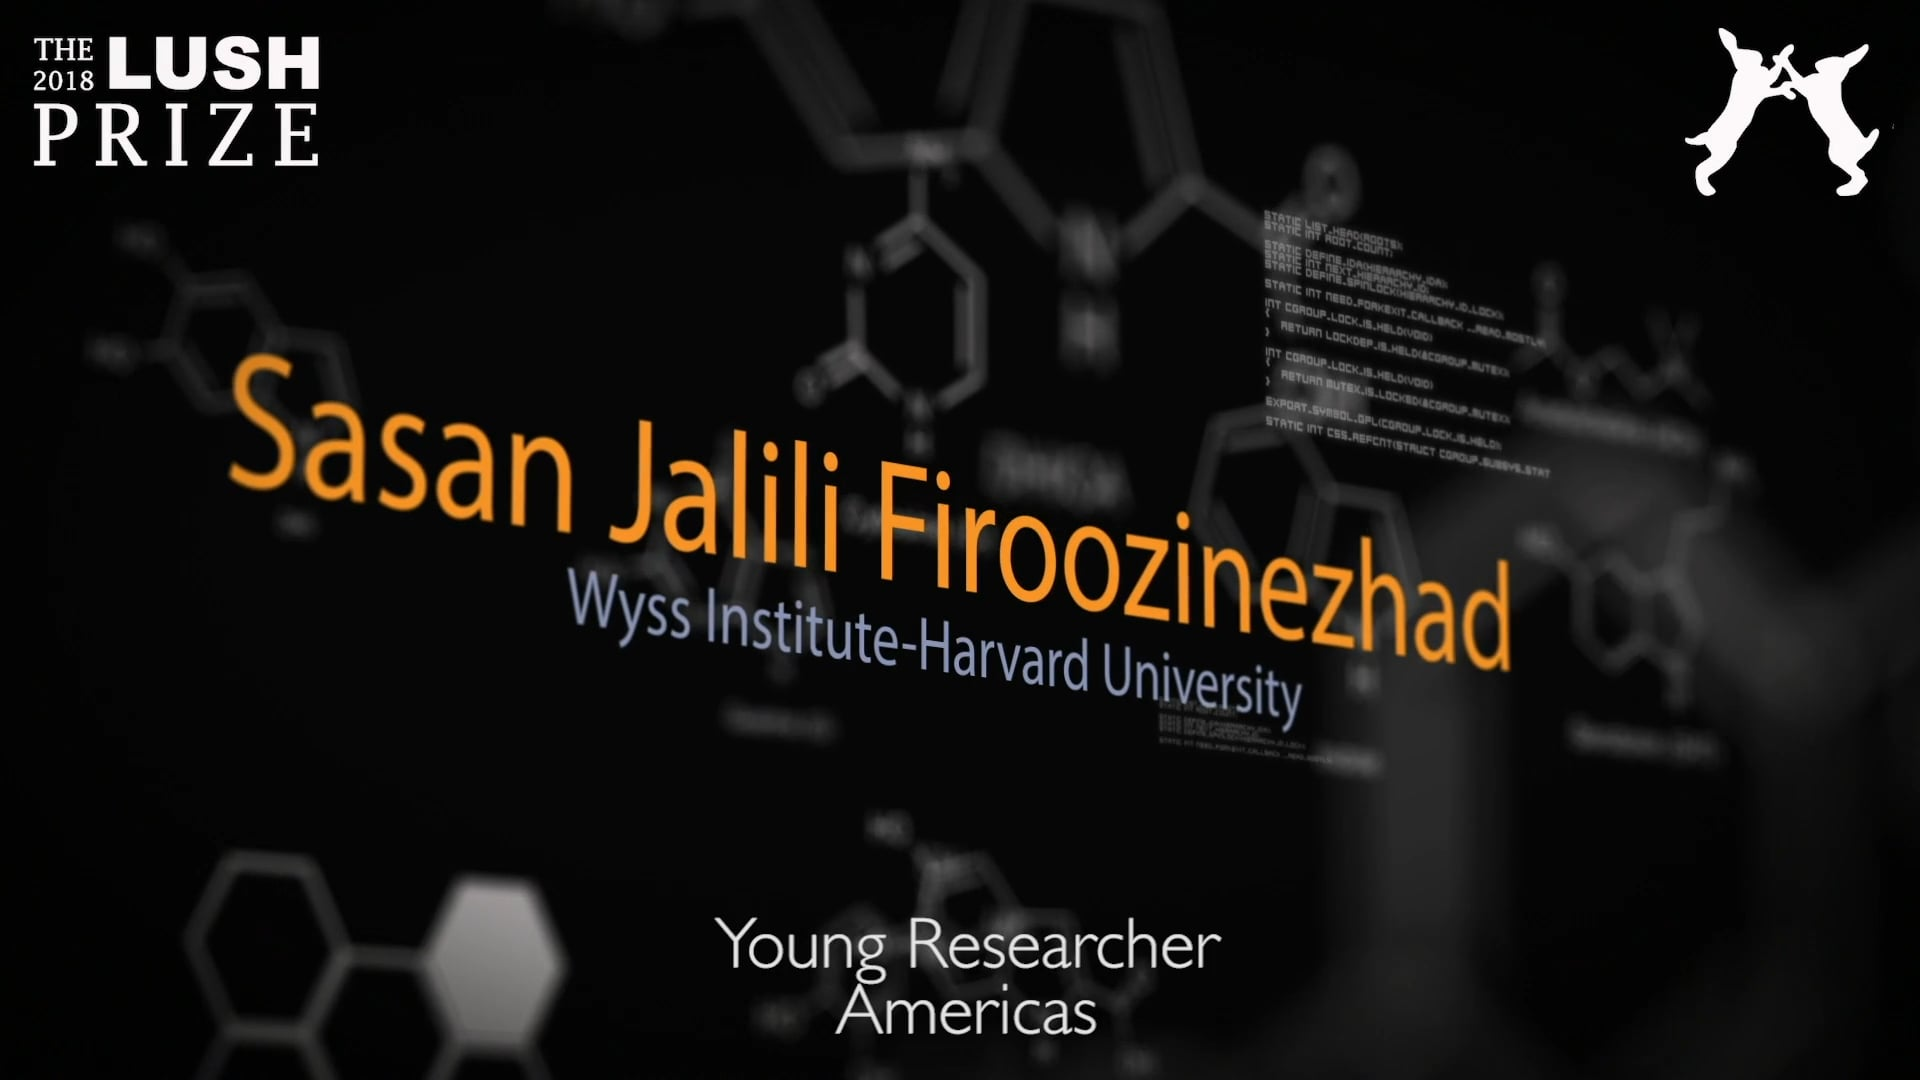 Sasan Jalili Firoozinezhad - Young Researcher Americas